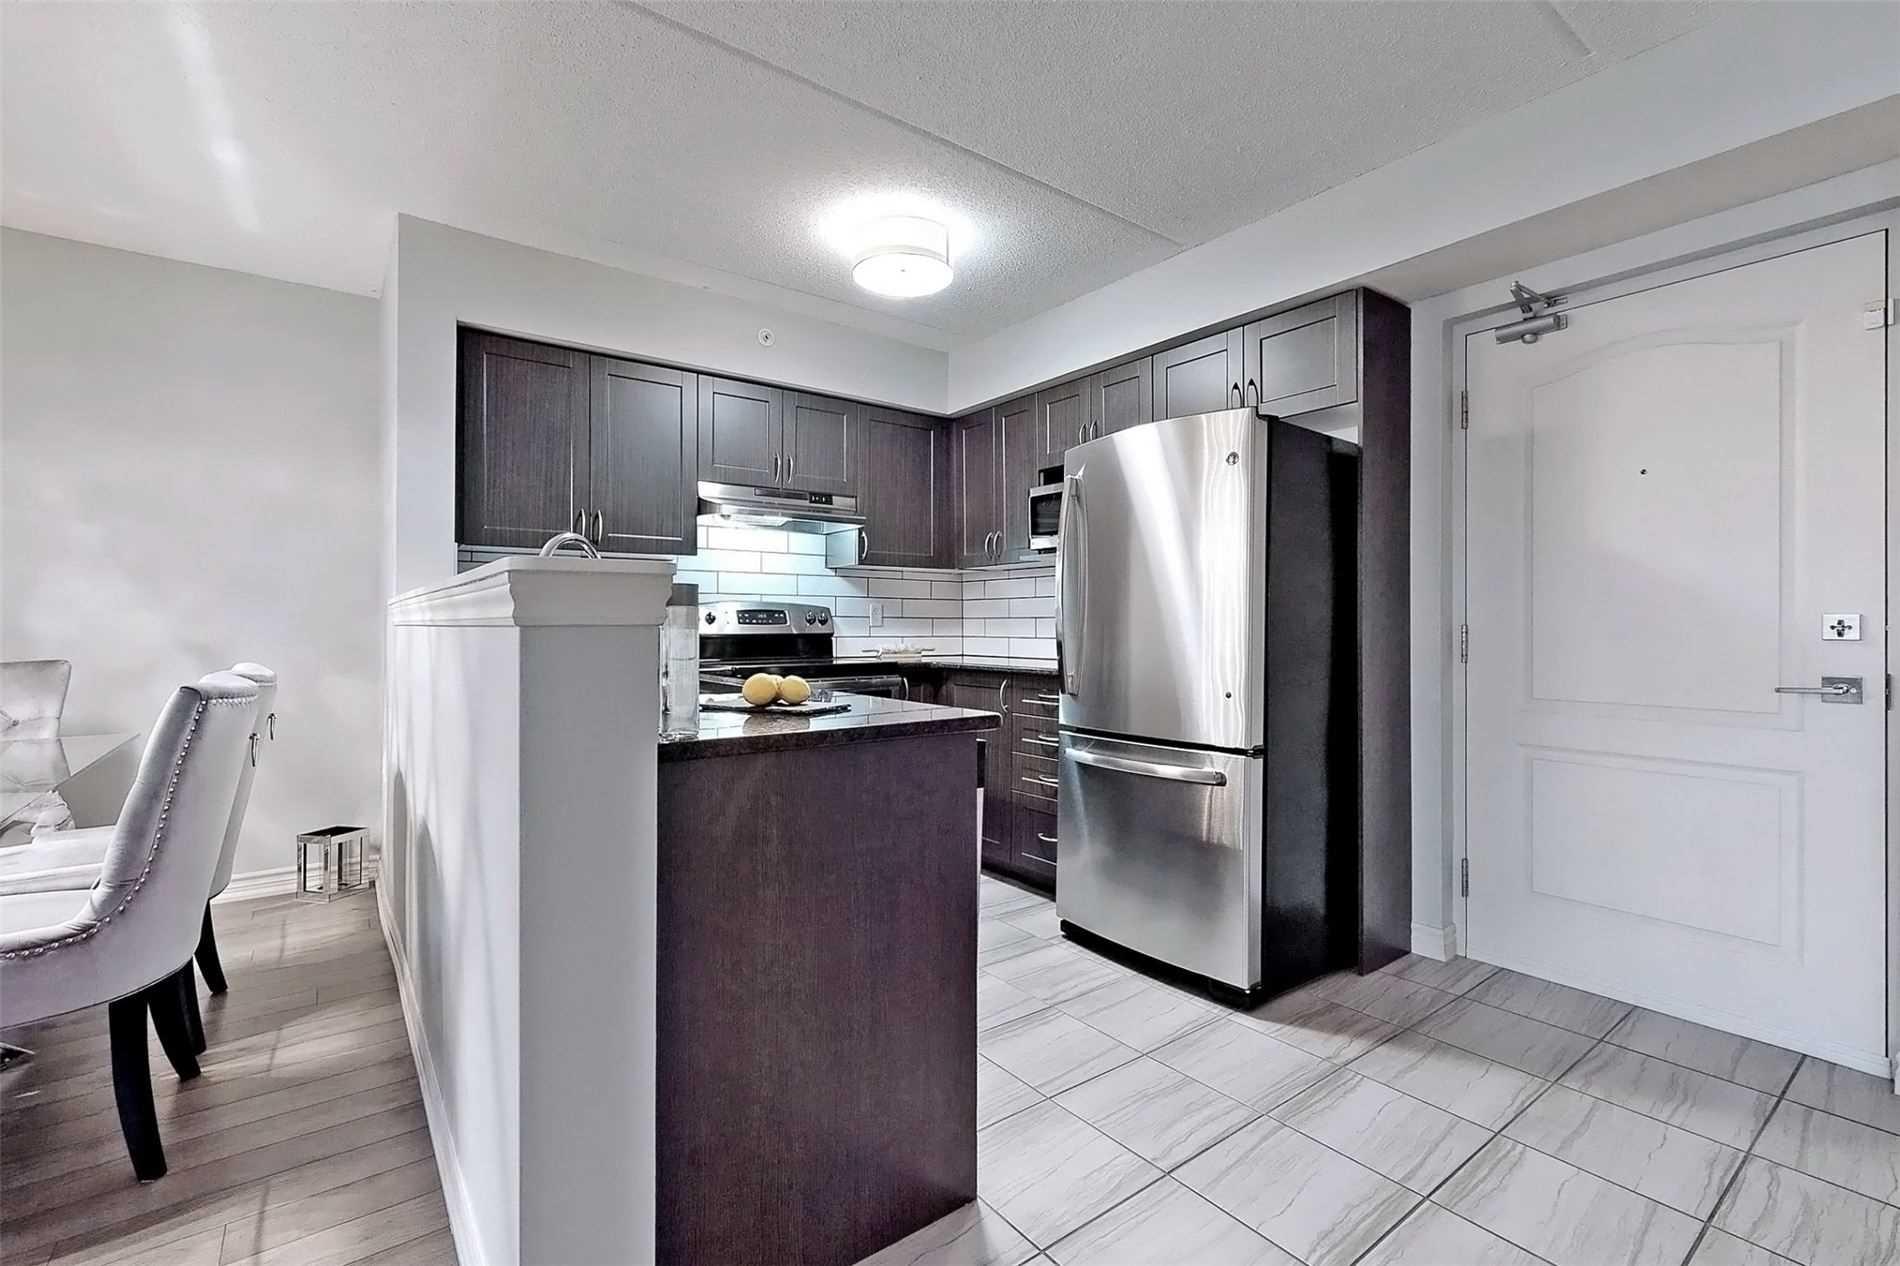 1460 Main St, Milton, L9T 8W5, 2 Bedrooms Bedrooms, ,2 BathroomsBathrooms,Condo Apt,For Sale,Main,W5087501